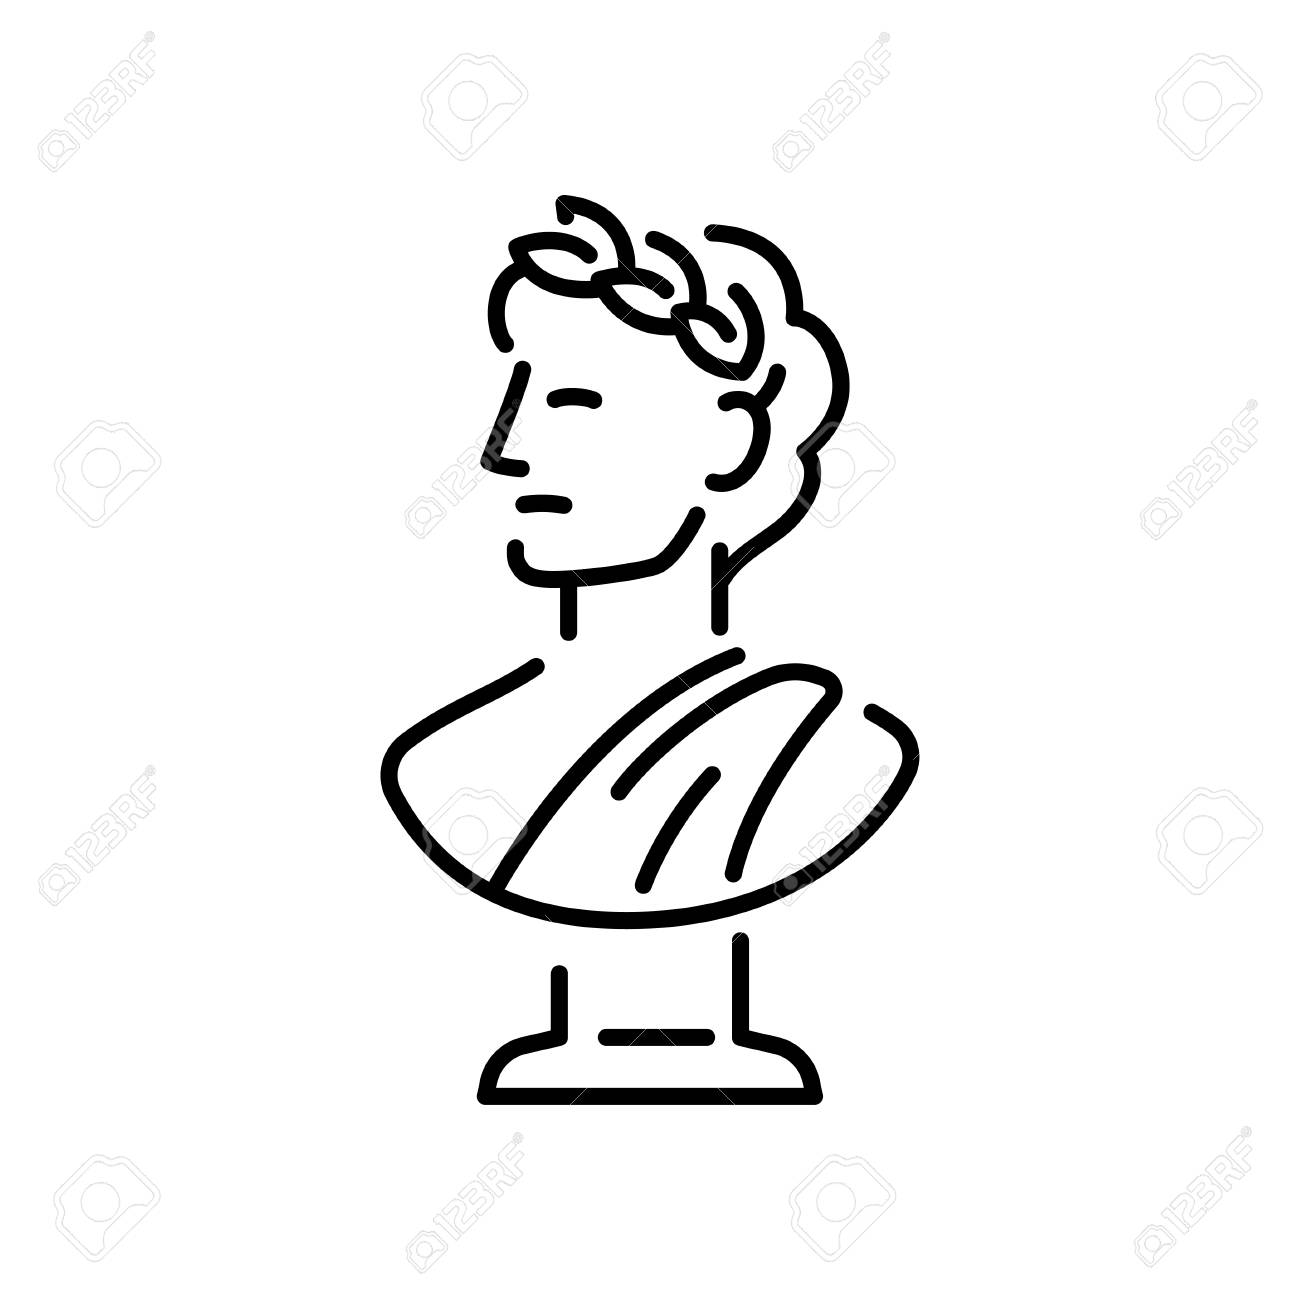 Ancient Greek sculpture with a laurel wreath. - 86537291